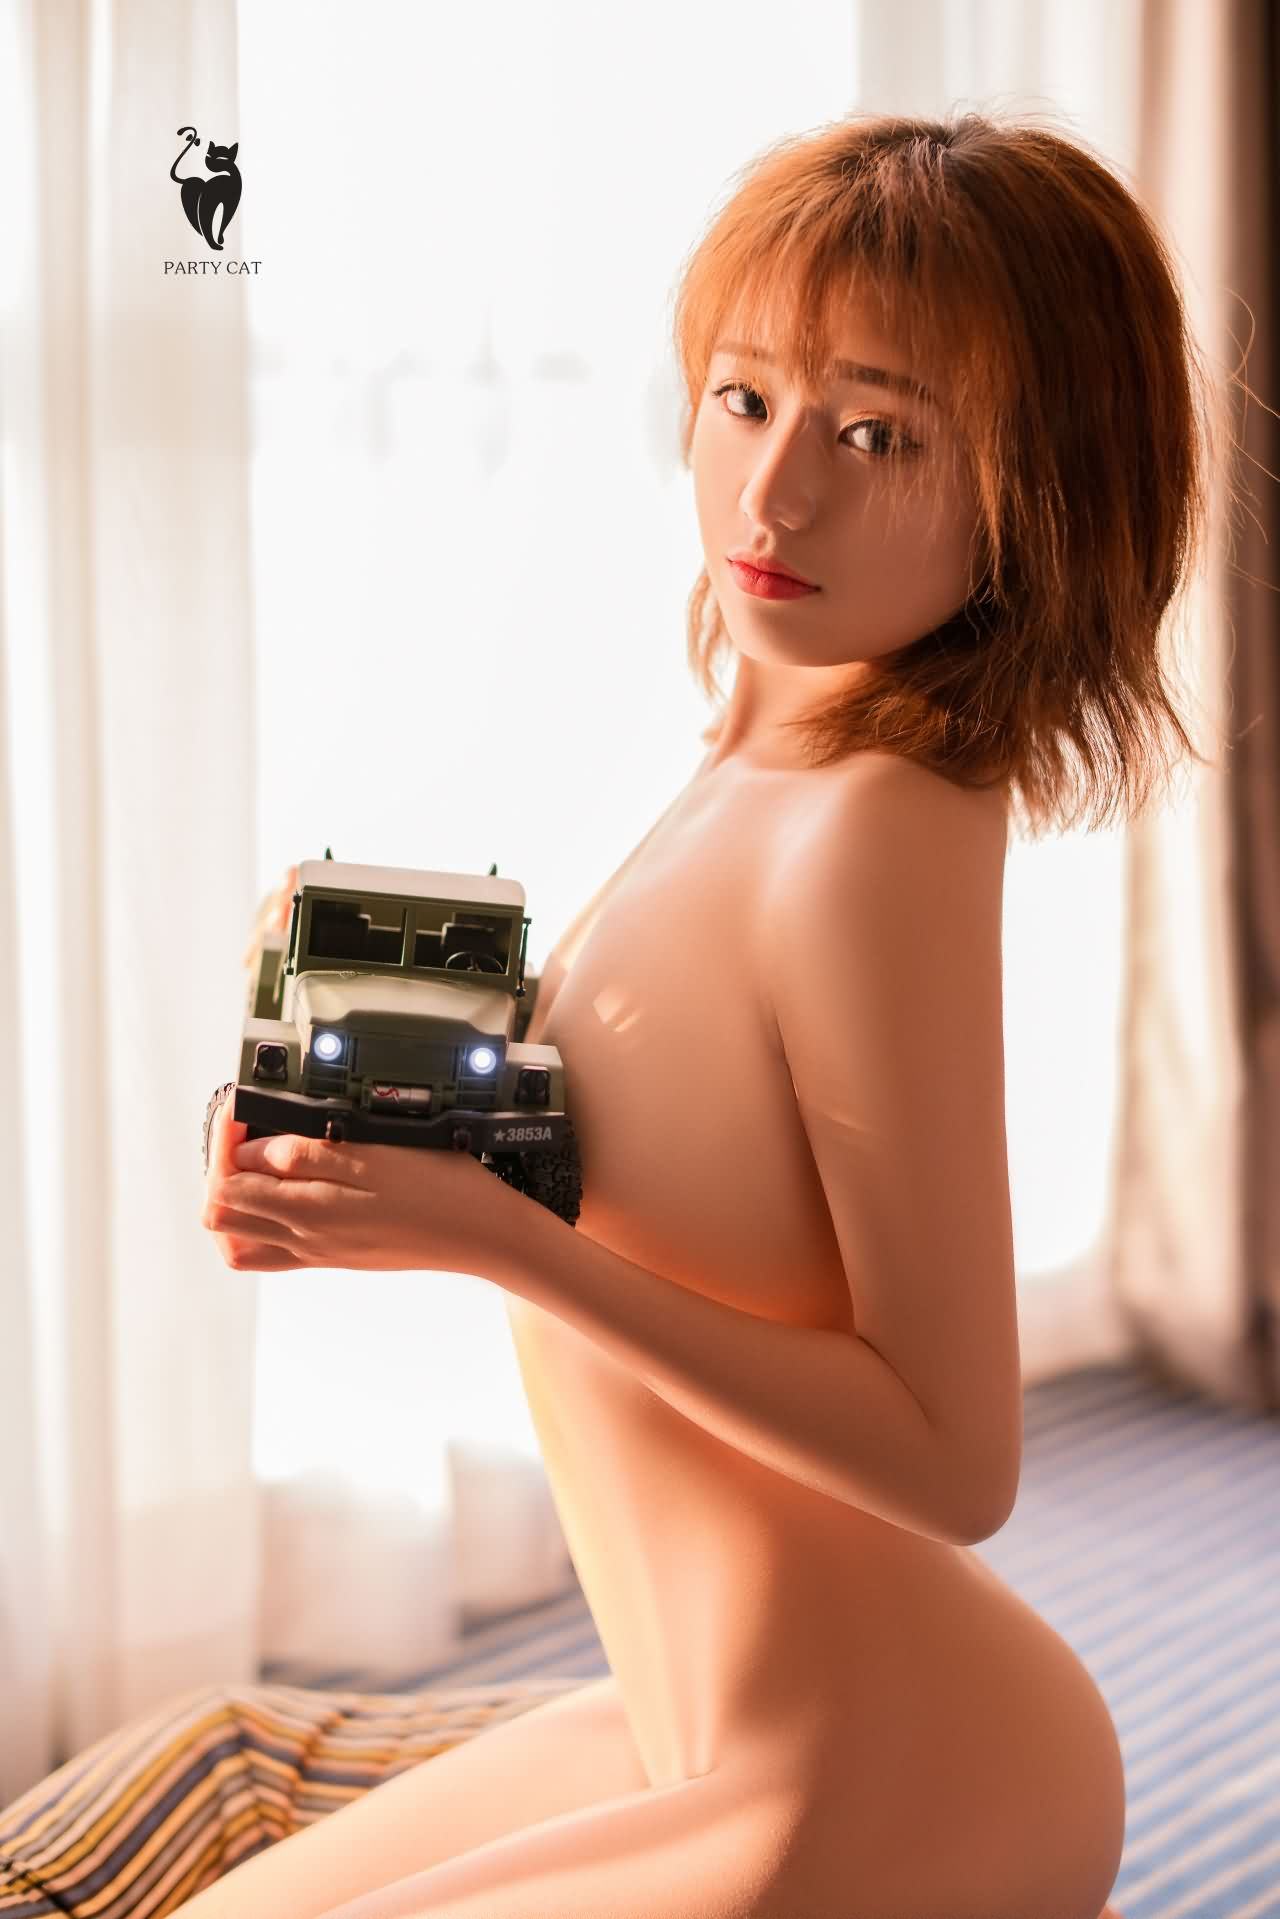 017e44aff720180628005384 - [PartyCat轰趴猫] 特刊 仓井优香-玩具车 33P